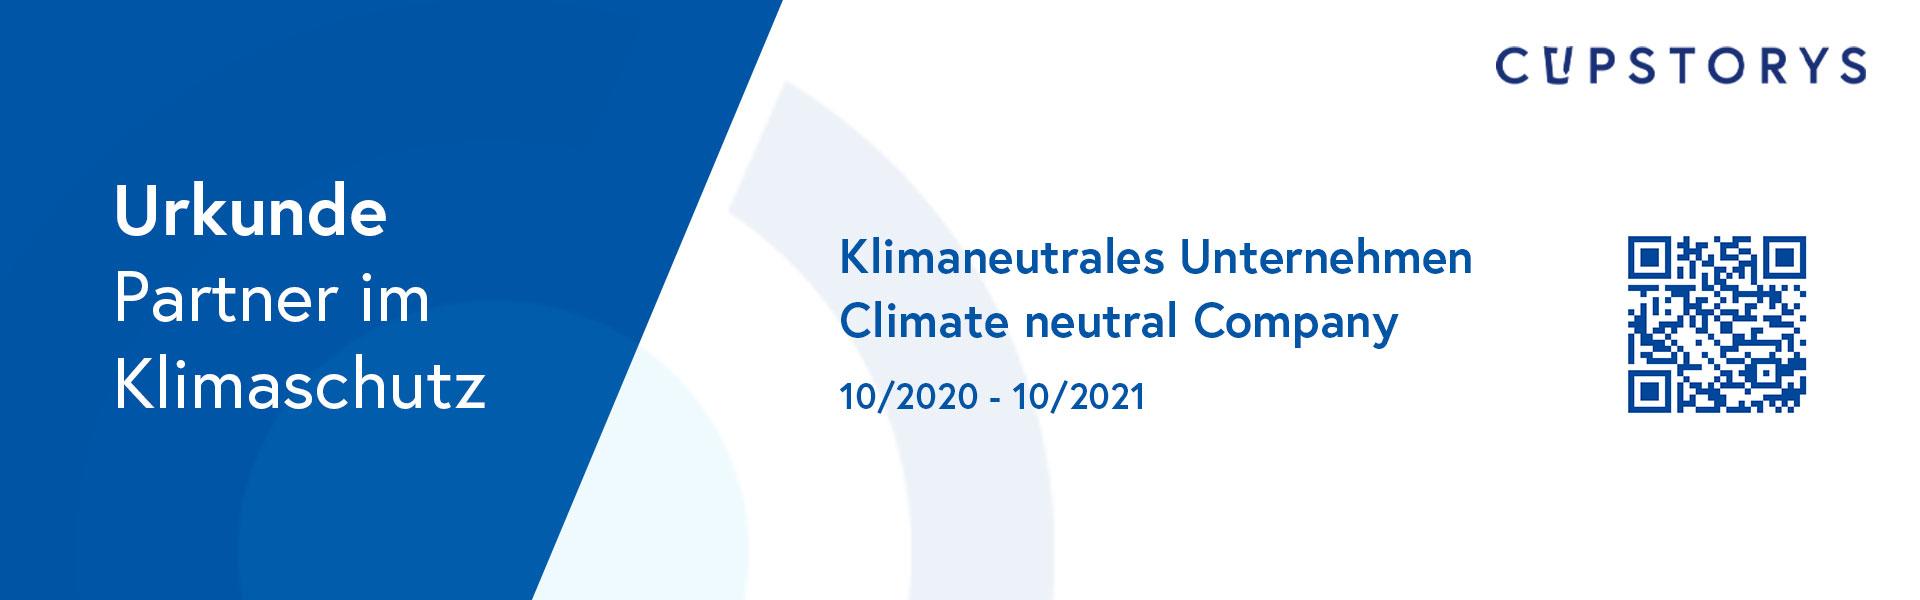 Klimaneutrale Unternehmen bei cupstorys.com